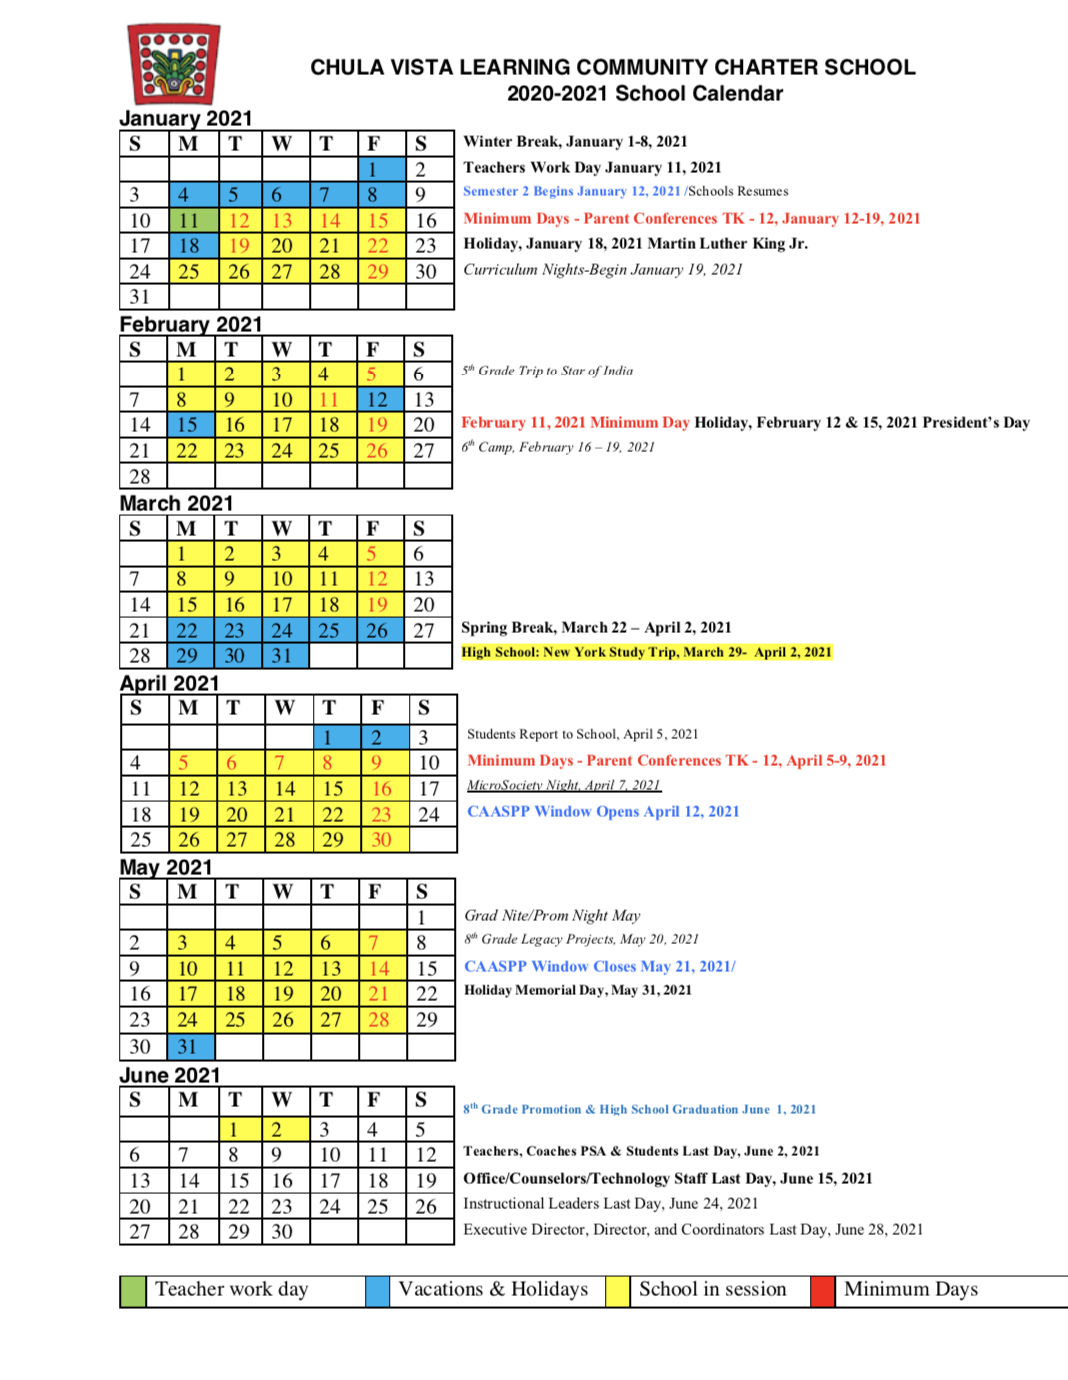 2020  2021 Calendar - About - Chula Vista Learning Community In San Diego School Calendar 2021 In Aiken County School Calendar 2021